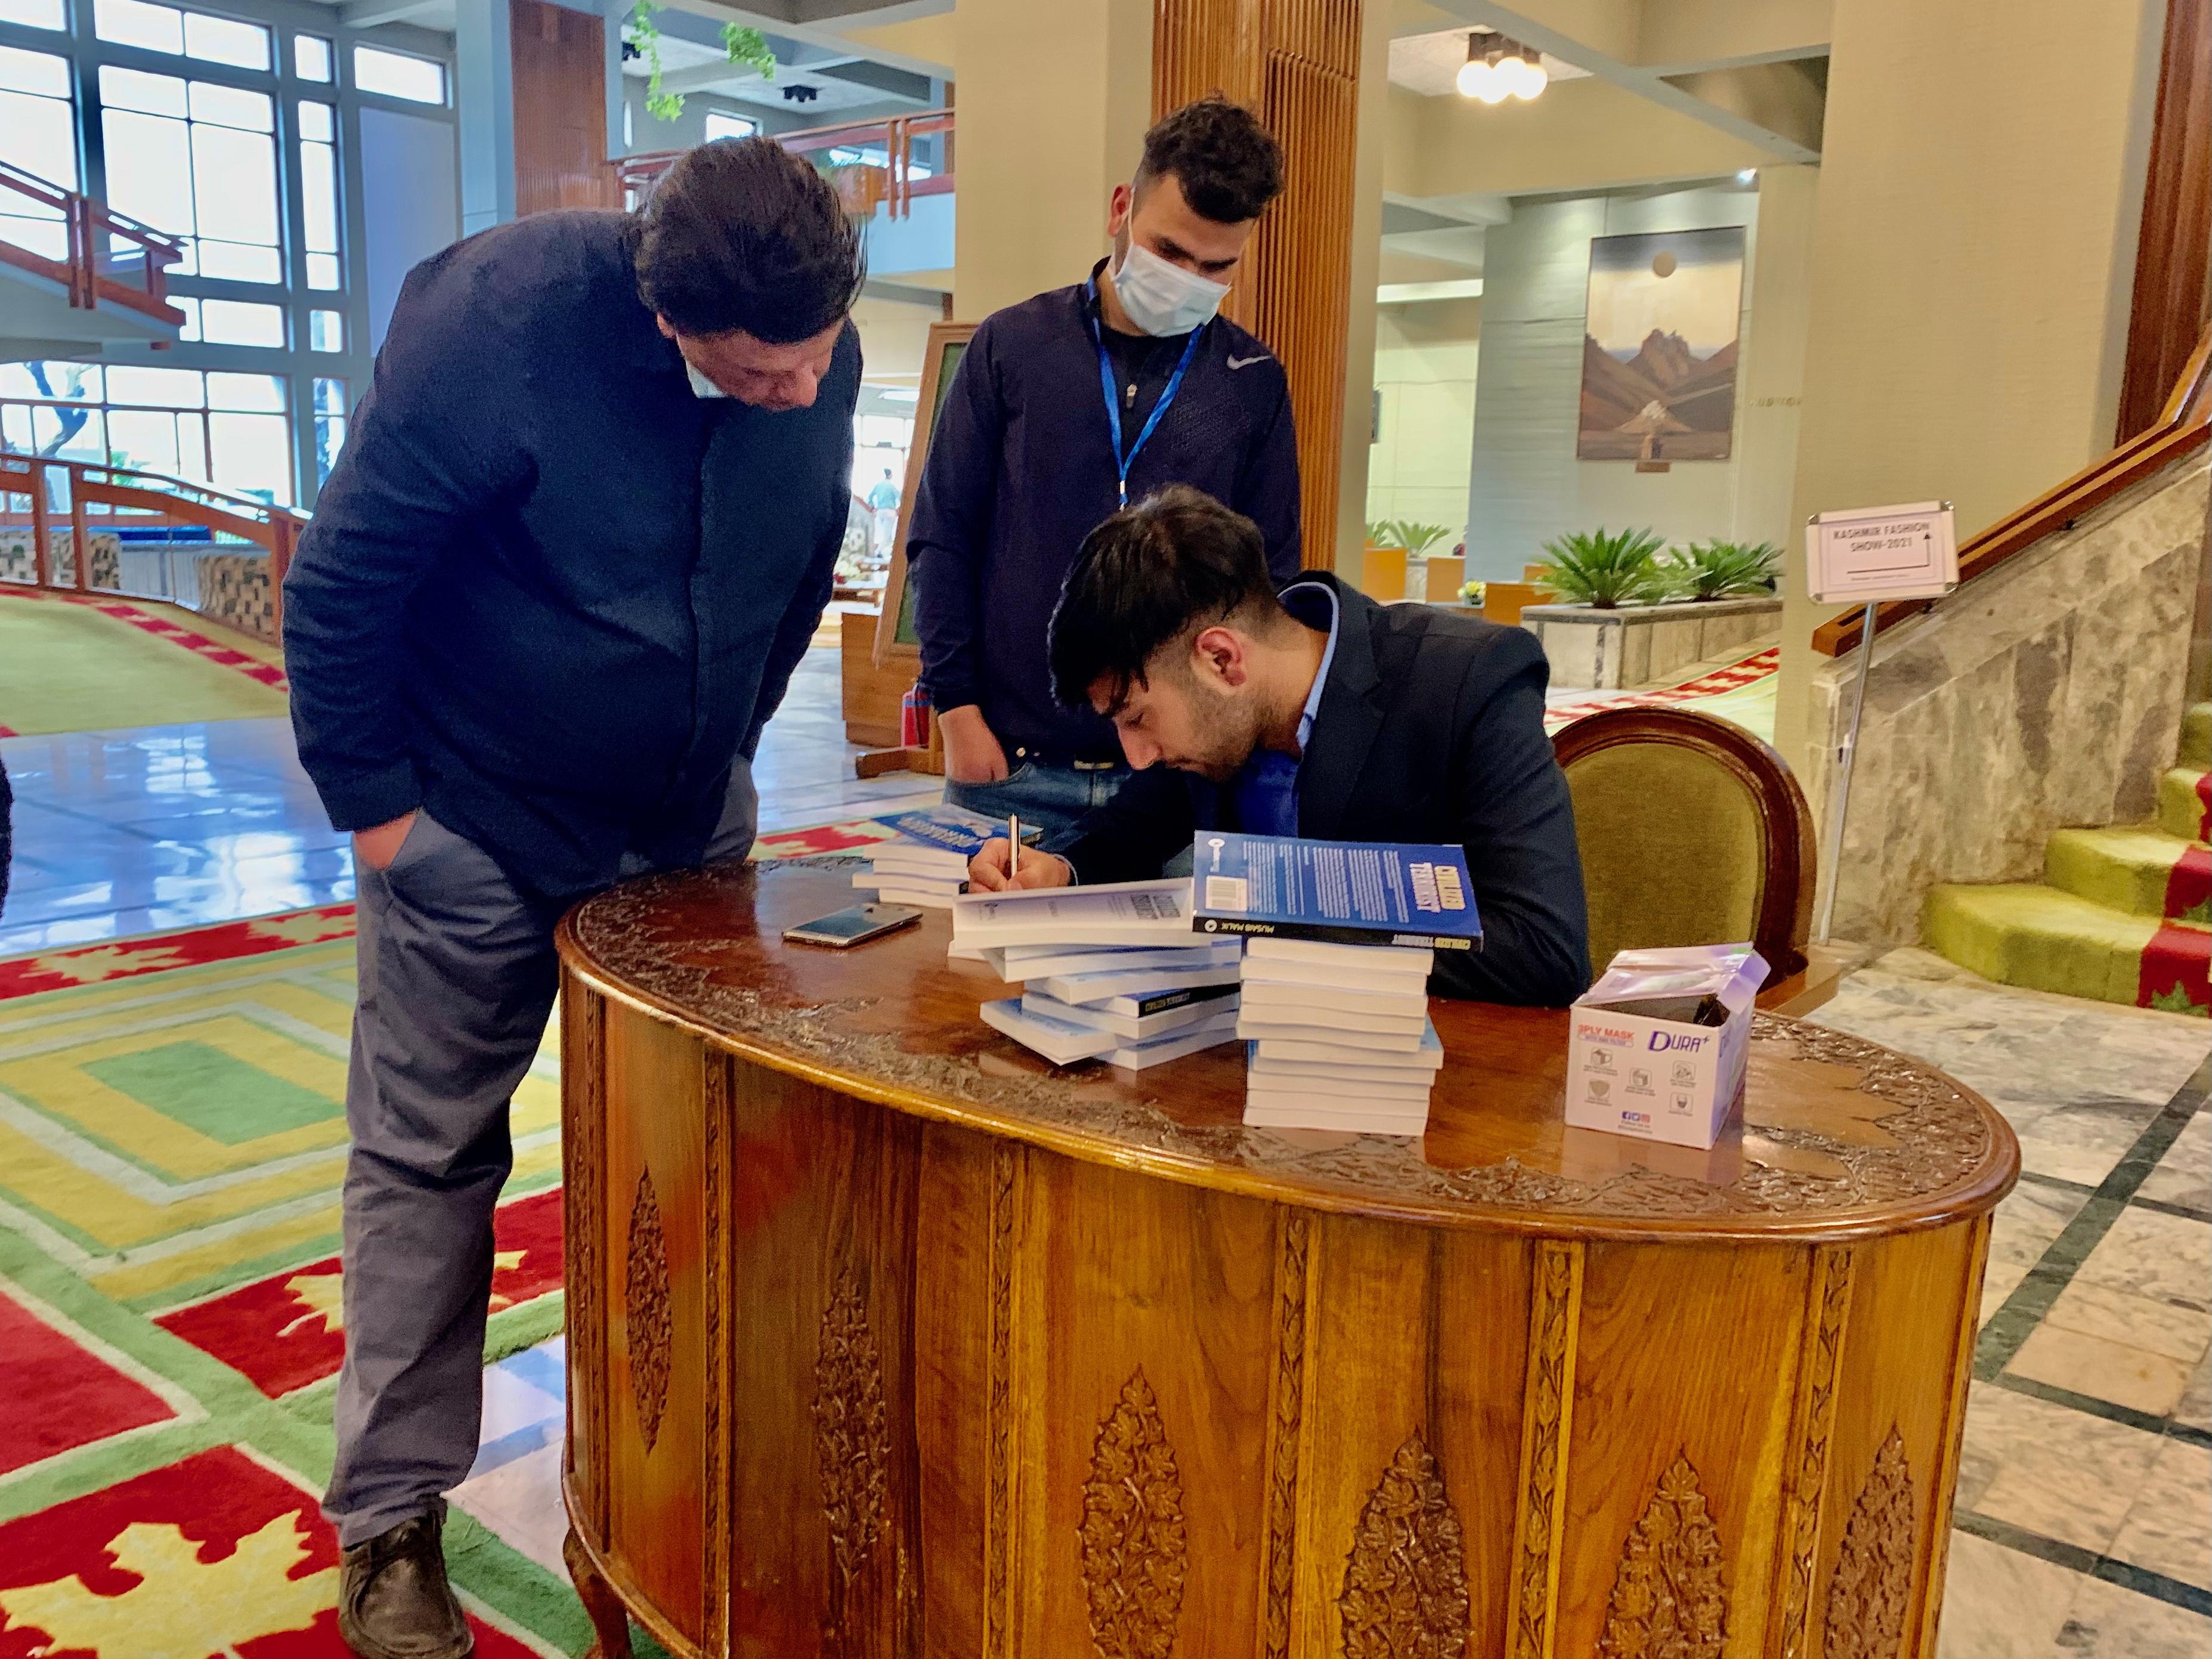 Musaib Malik, 18 Year-Old Boy Changing Lives With His Book